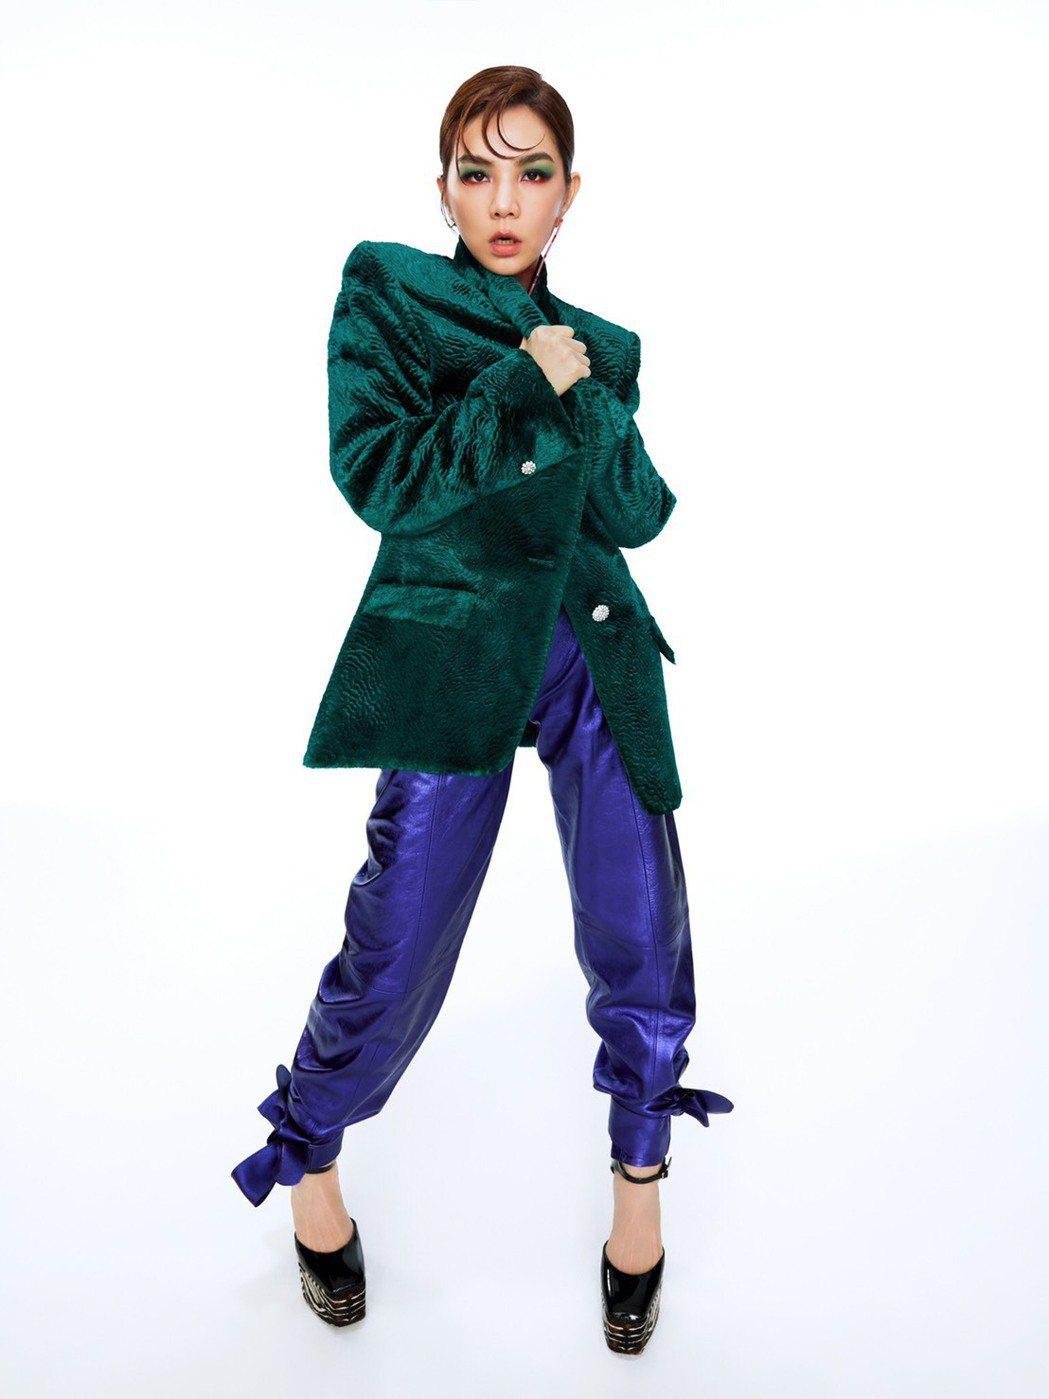 Ella陳嘉樺將出席高雄跨年晚會唱壓軸。圖/民視提供